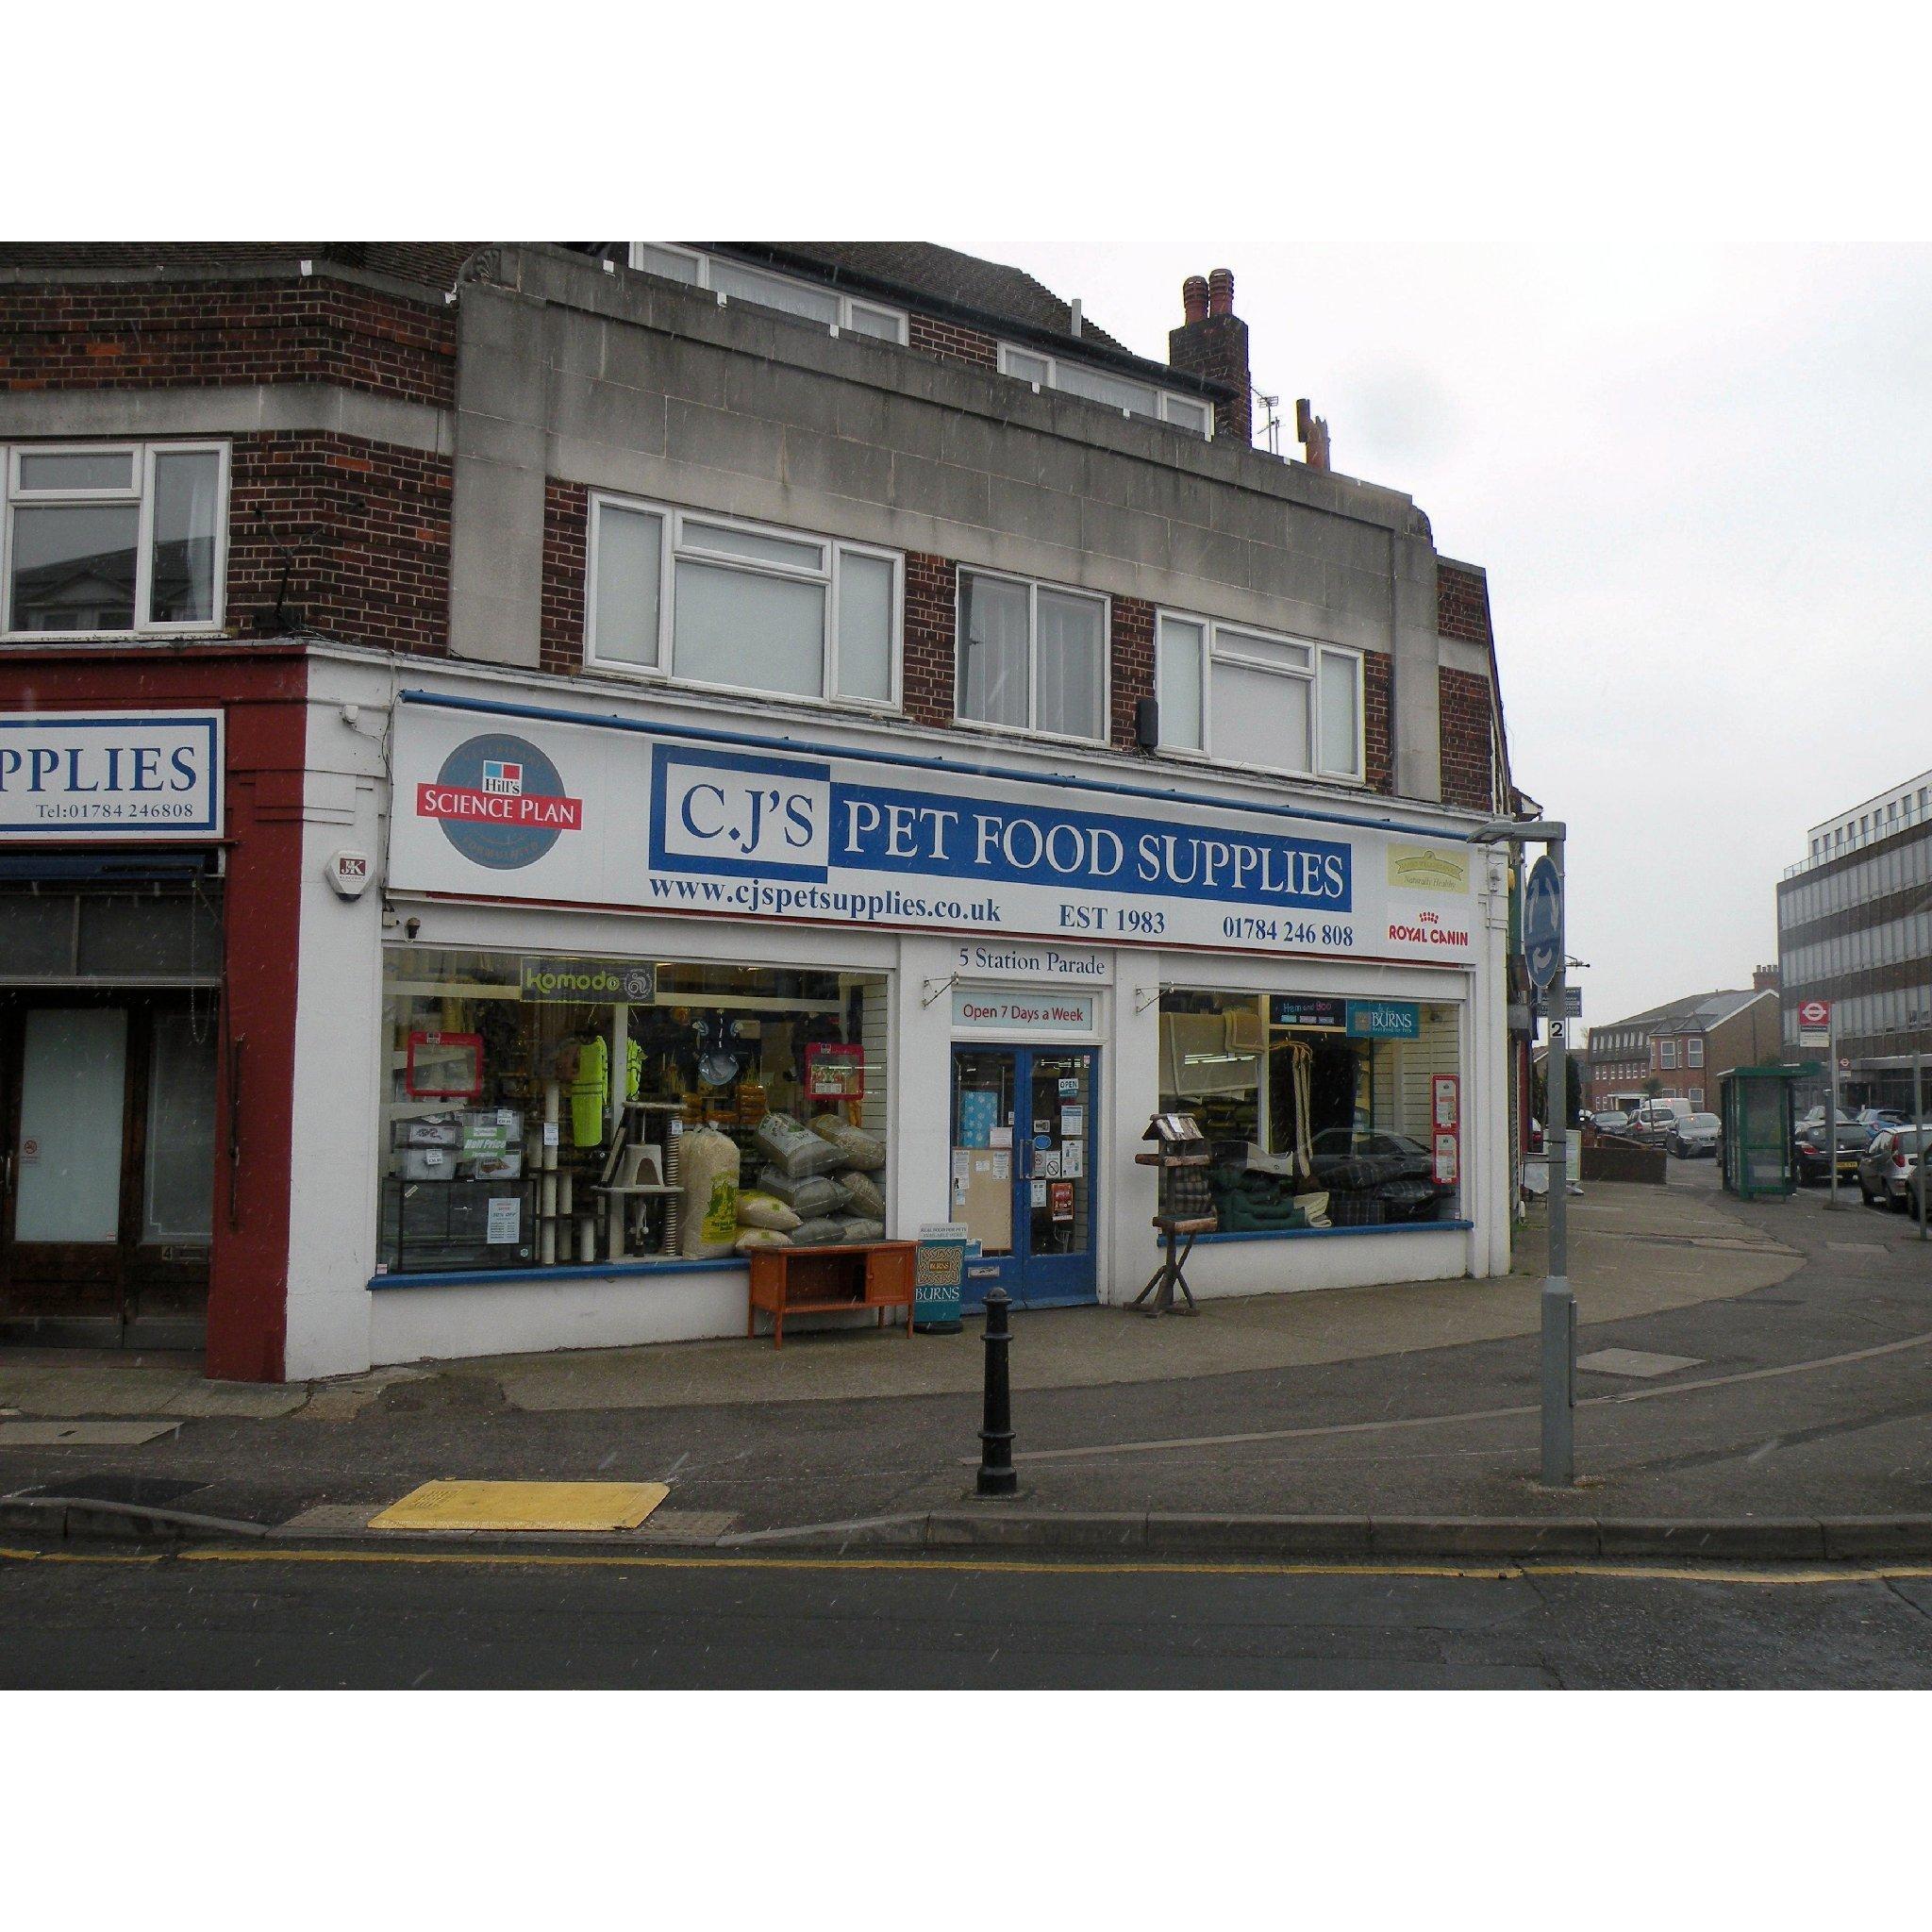 C.J's Petfood Supplies - Ashford, Surrey TW15 2RX - 01784 246808 | ShowMeLocal.com